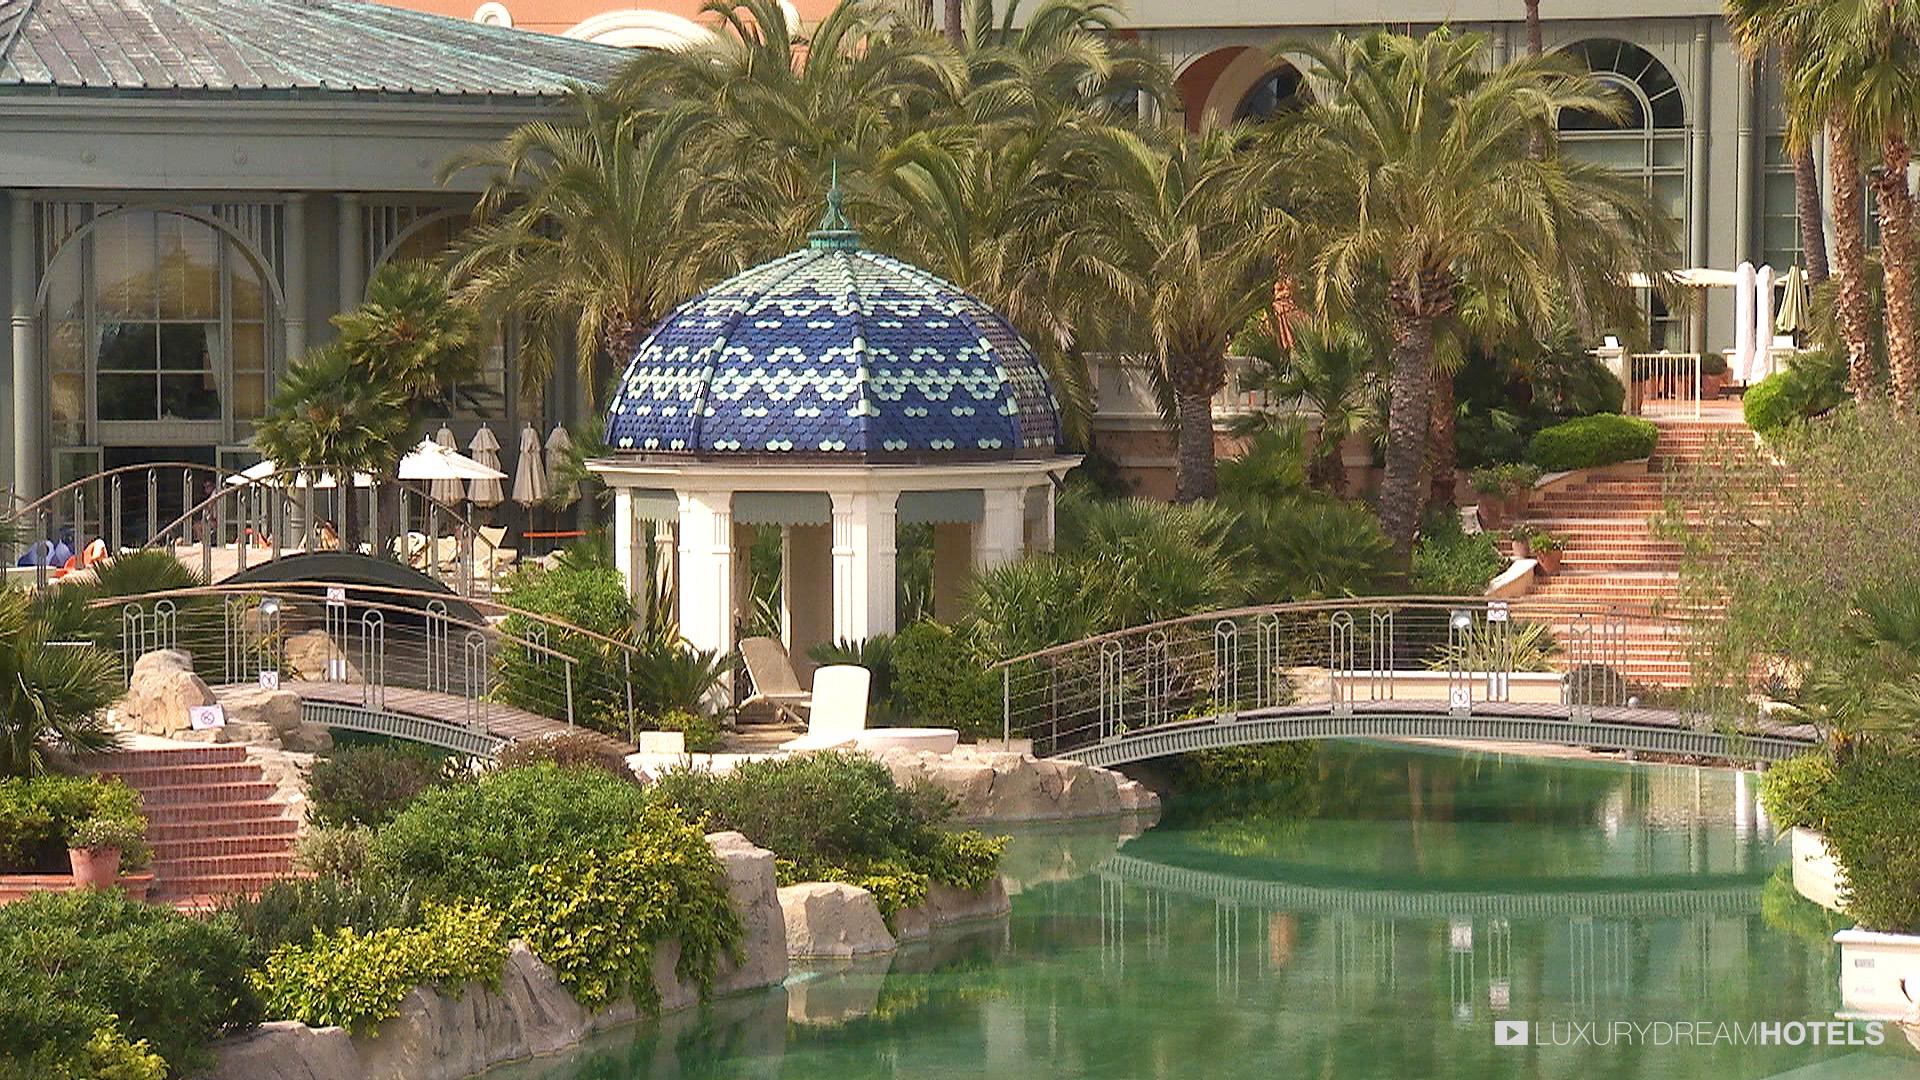 Luxury Dream Hotels - Monte Carlo Bay